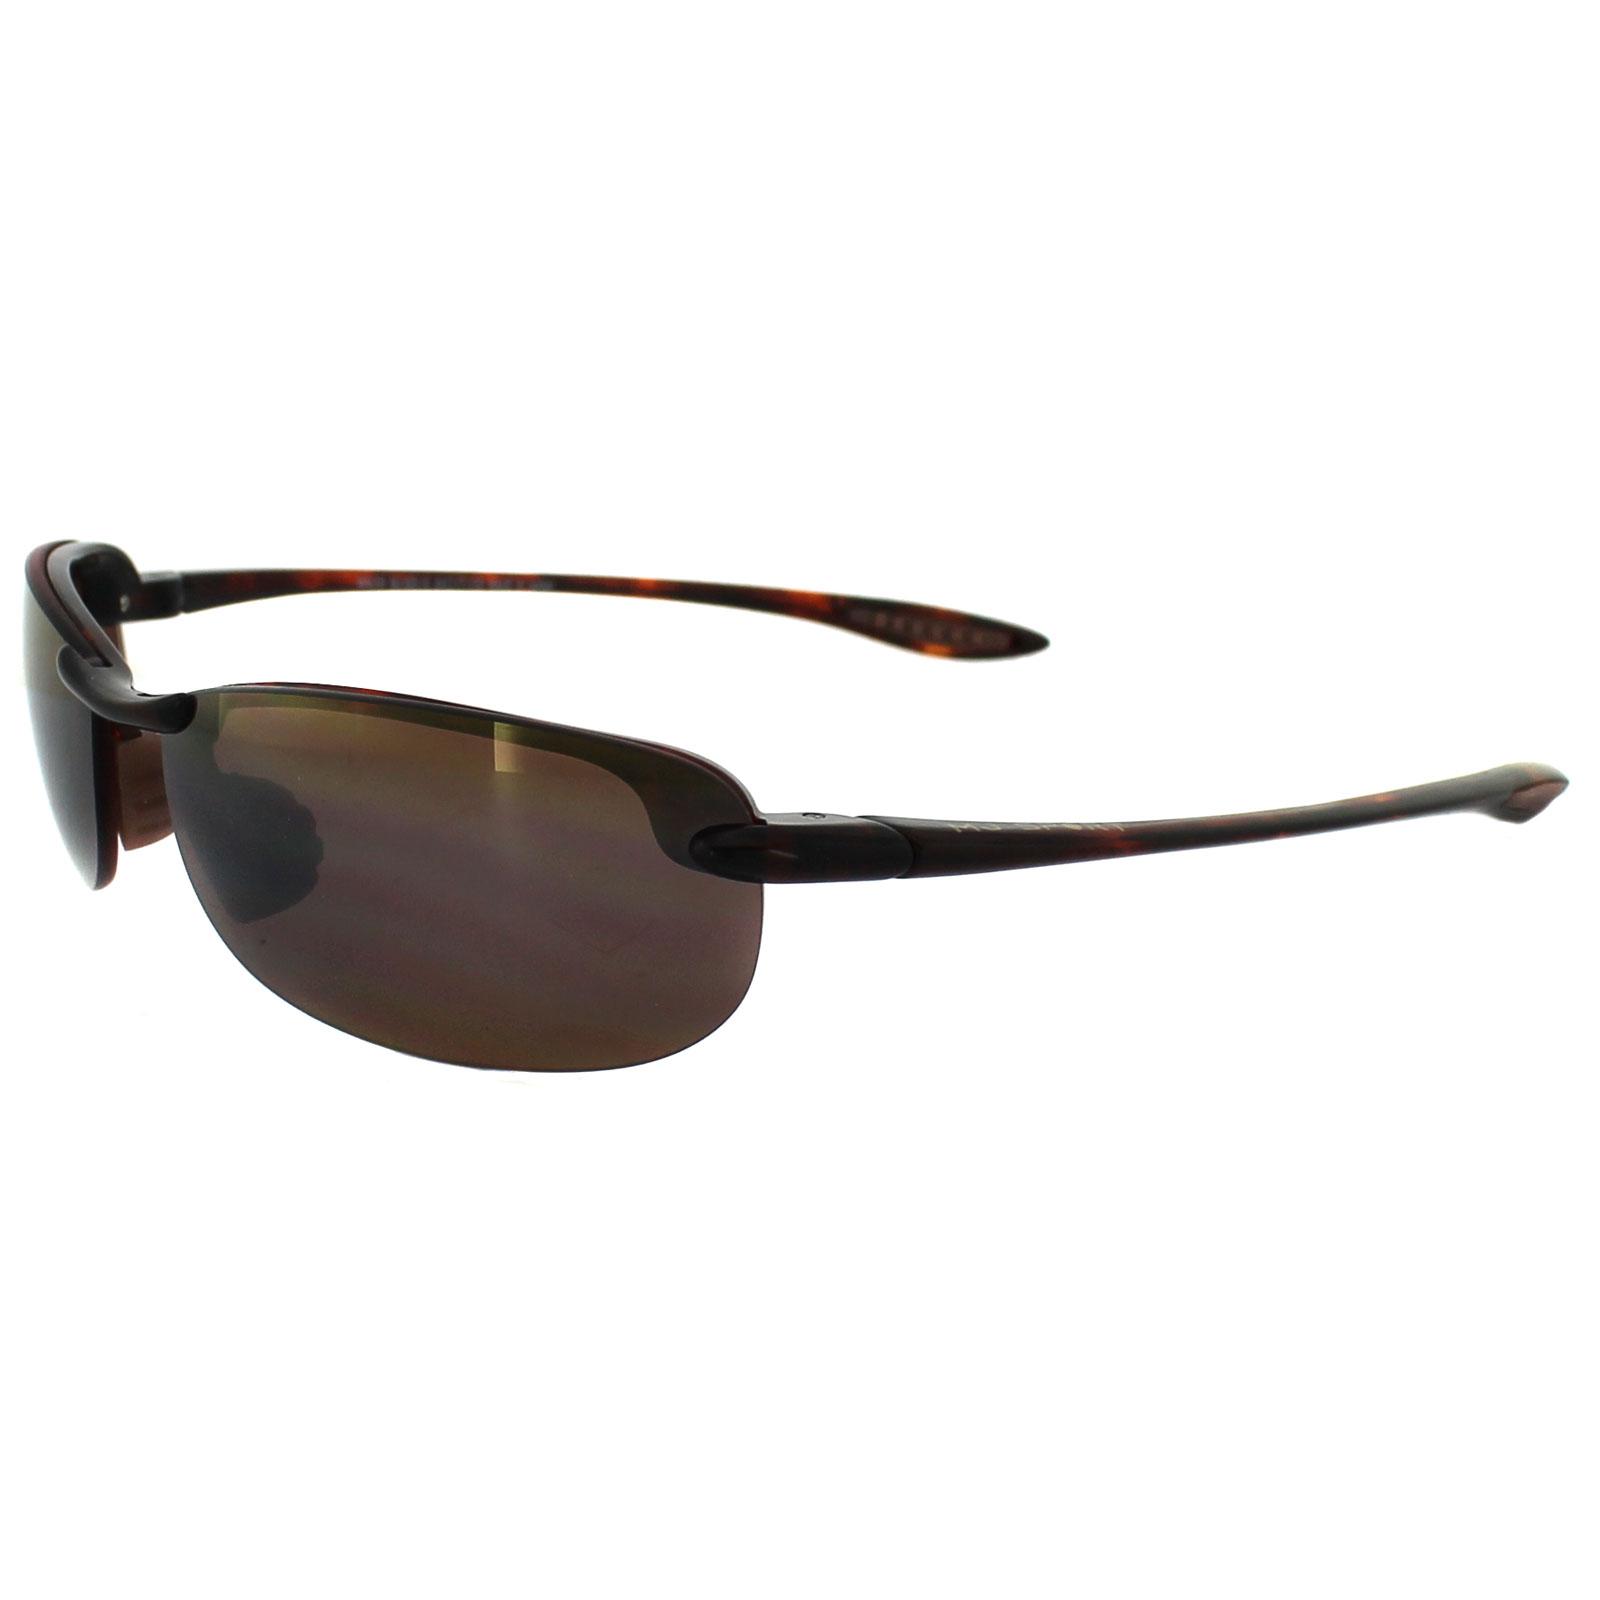 5131a9617e51 Sentinel Maui Jim Sunglasses Makaha H405-10 Tortoise Bronze Polarized